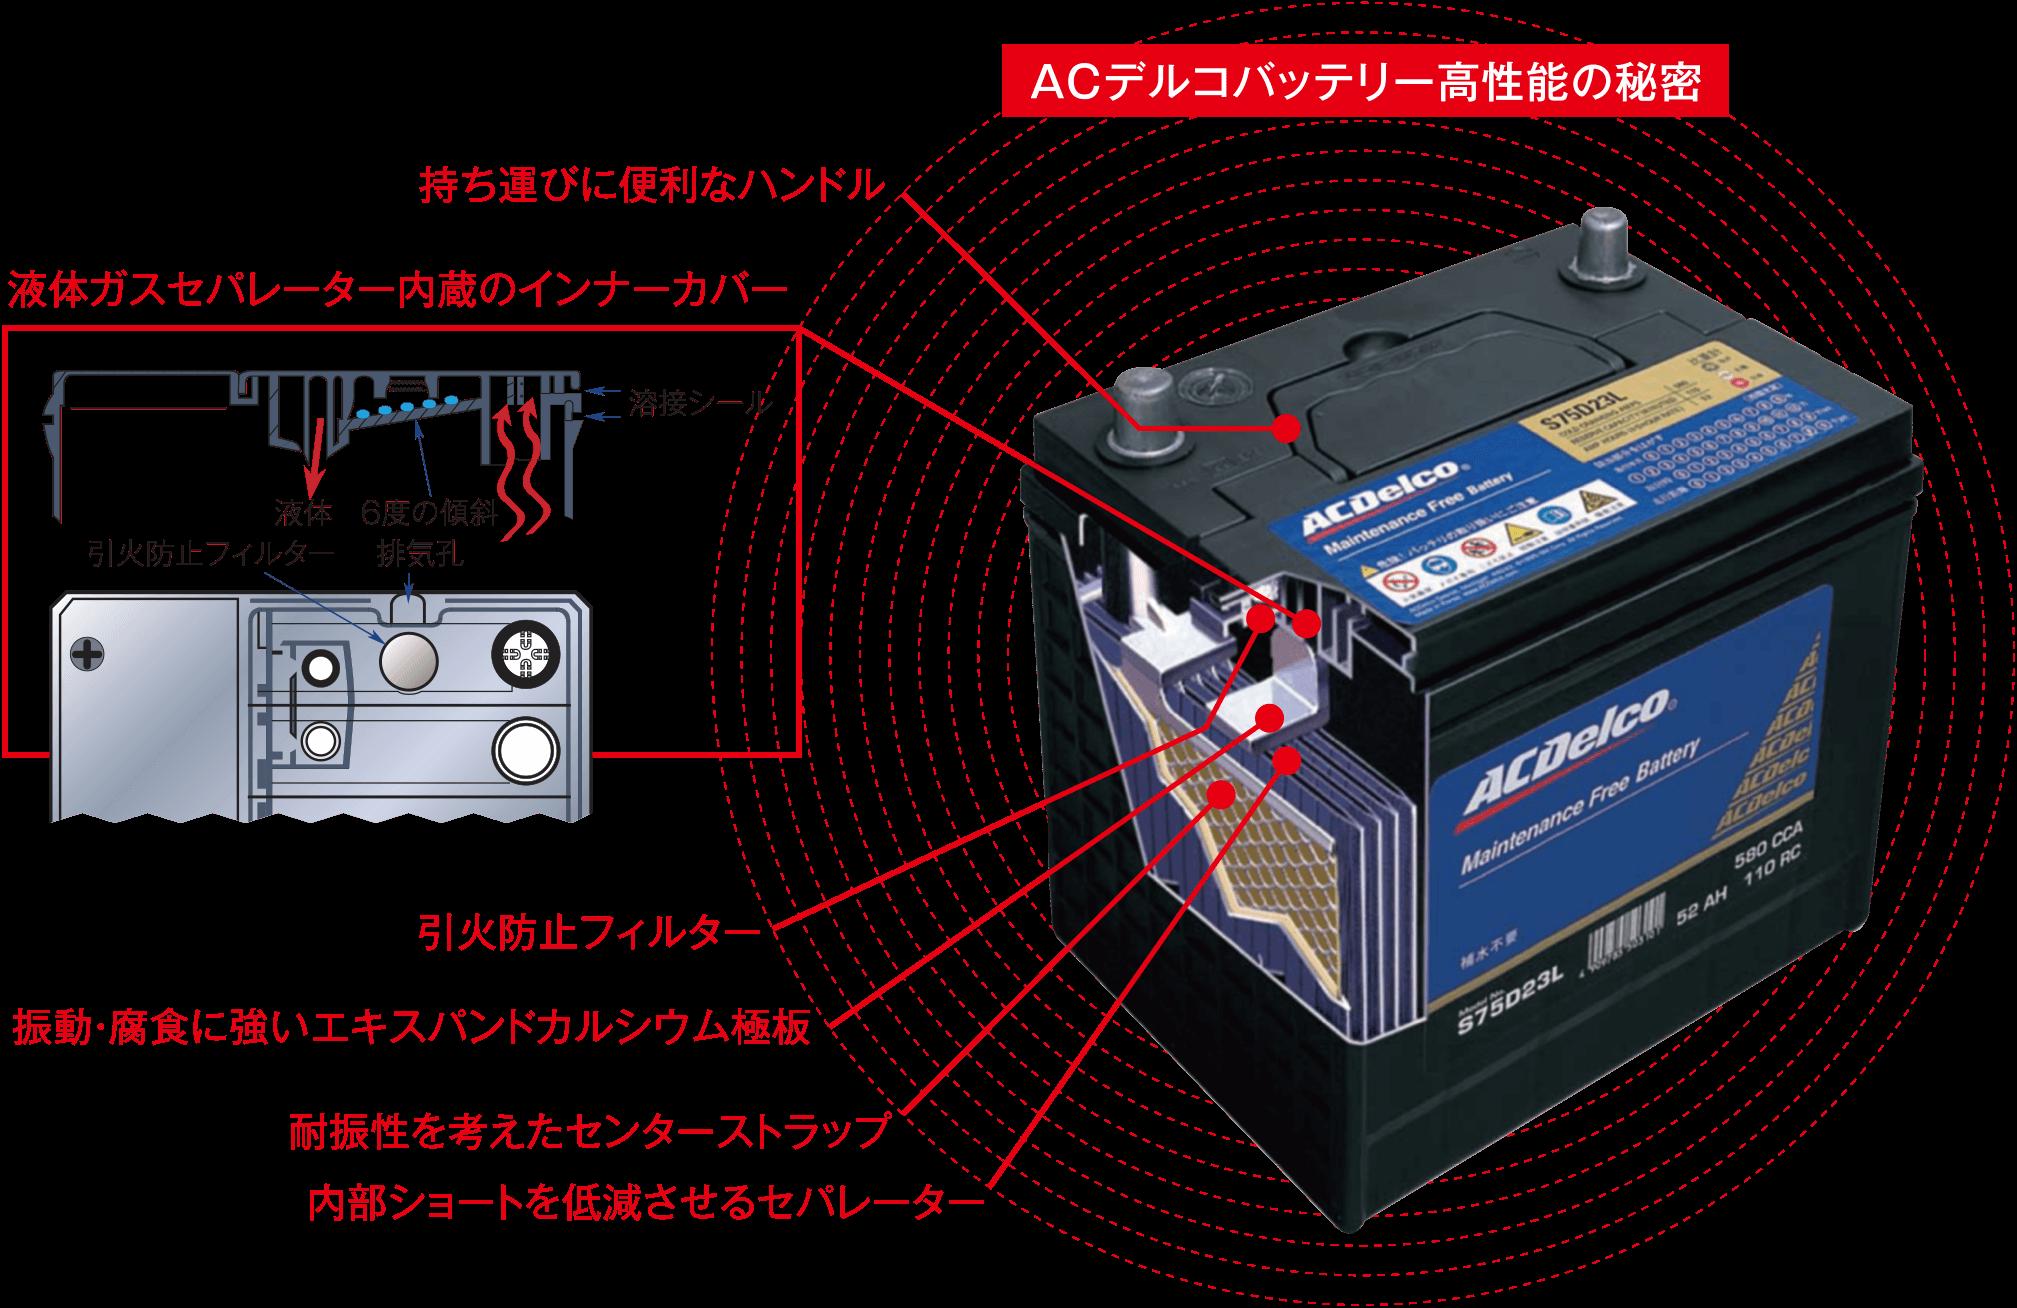 ACデルコバッテリー高性能の秘密